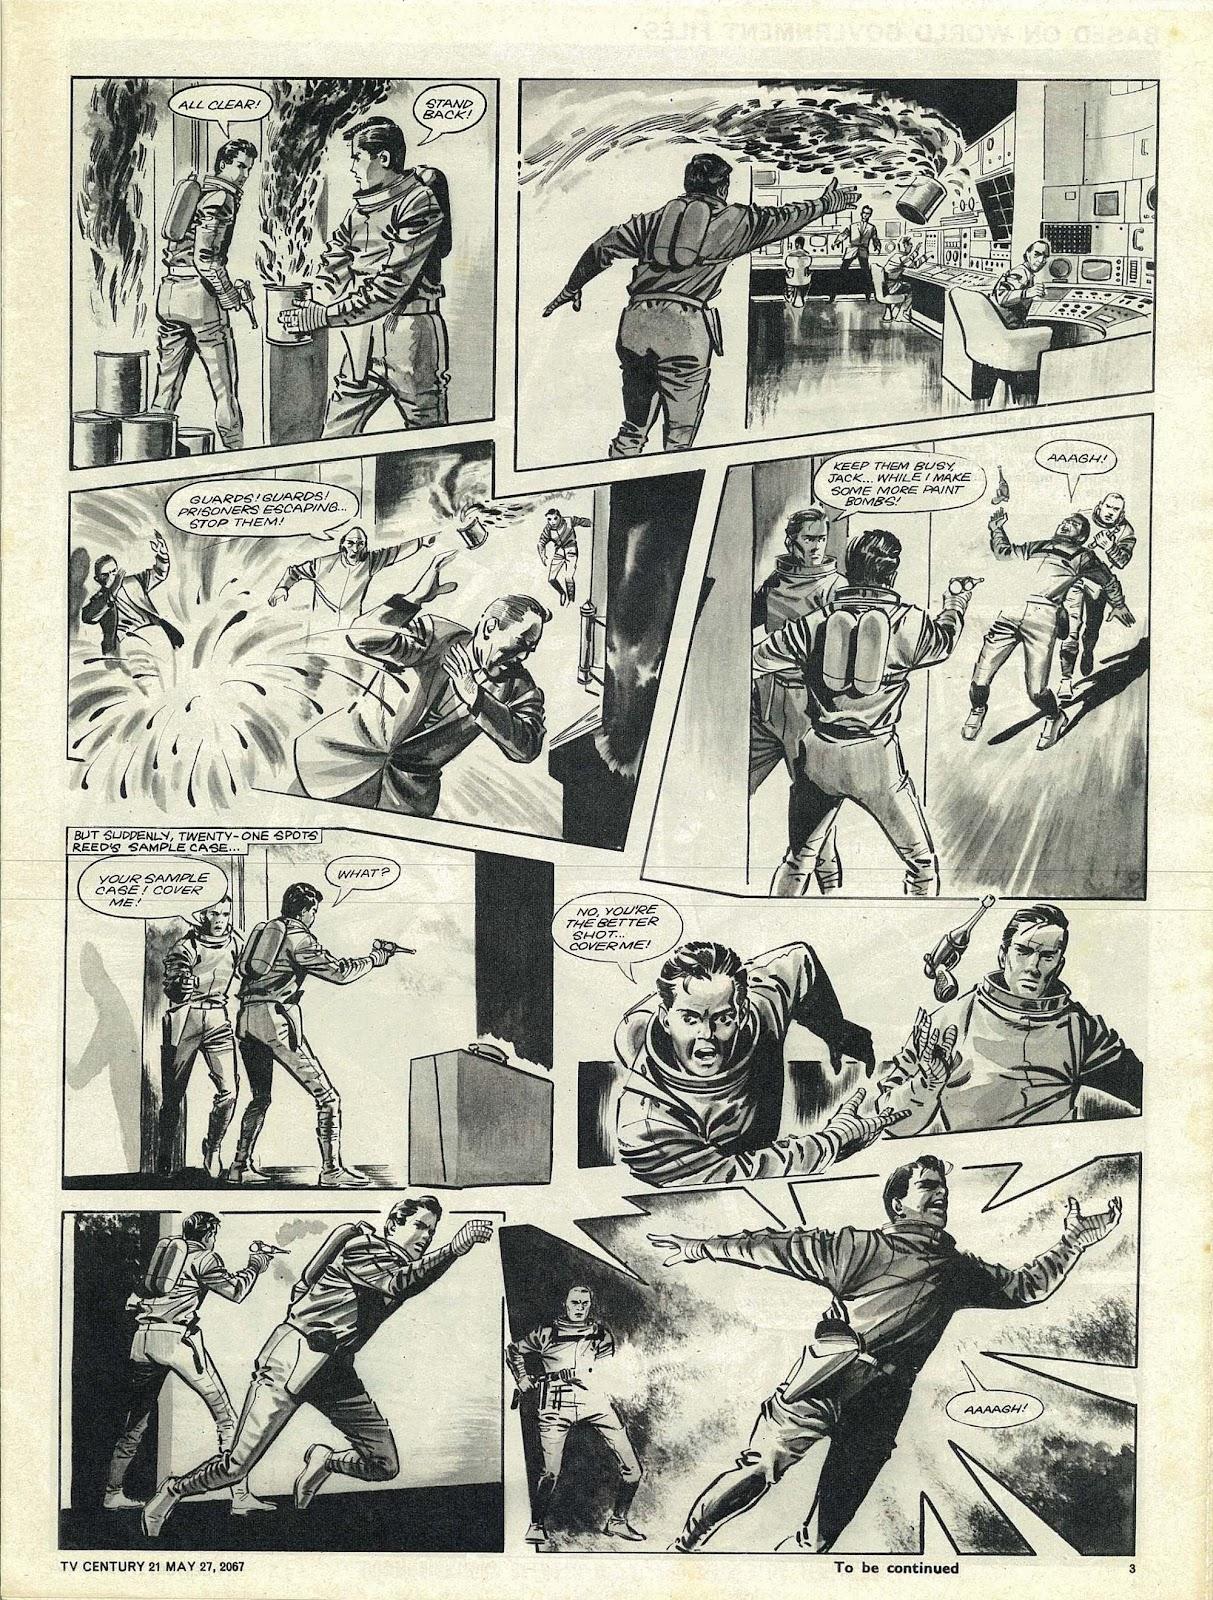 TV Century 21 (TV 21) issue 123 - Page 3